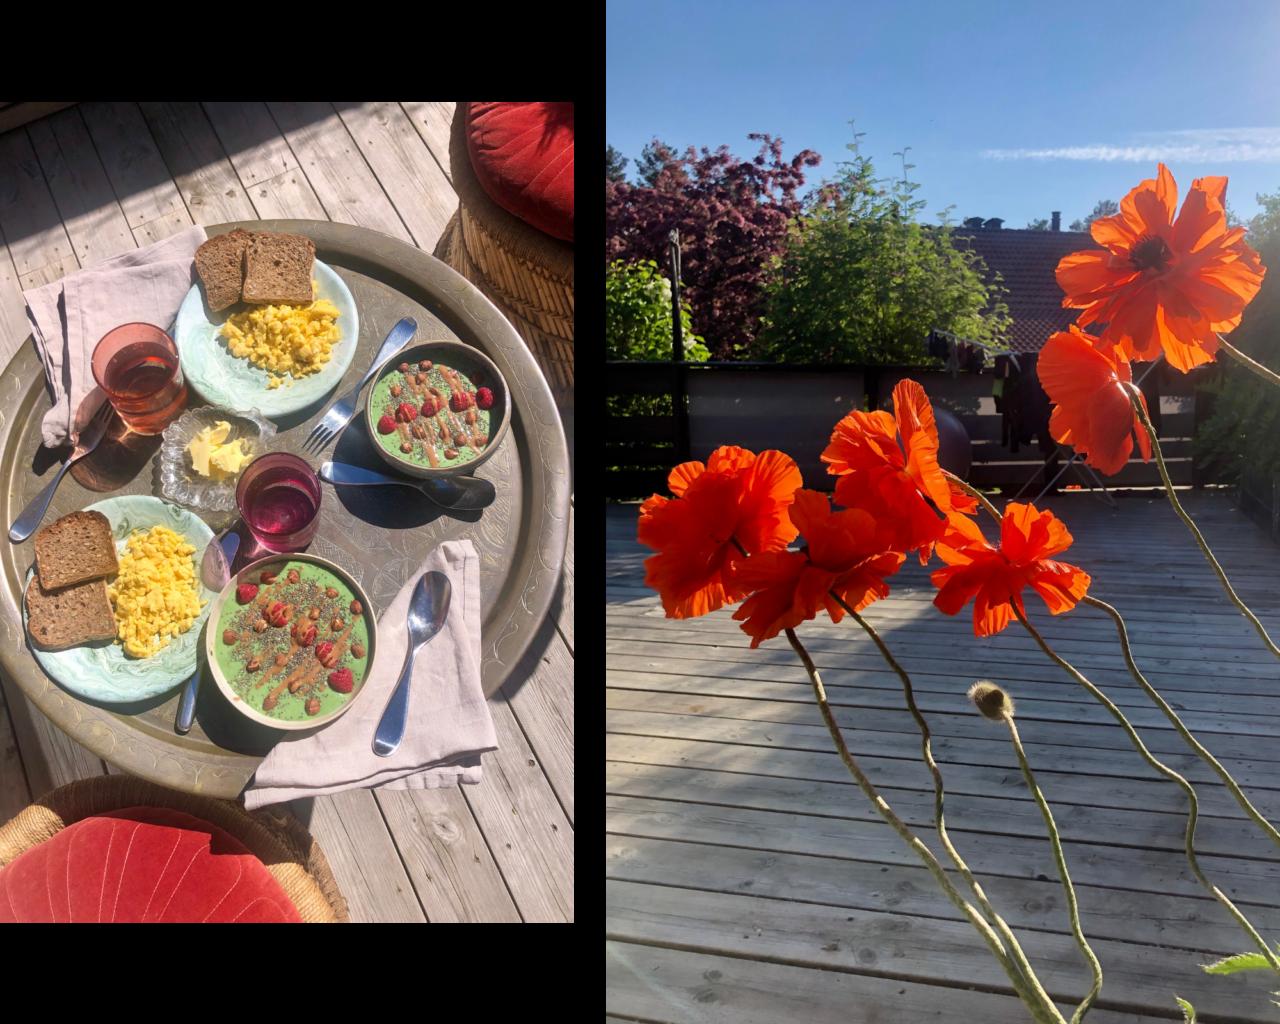 valmuer-terrasse-frokost-smoothie-bowl-greenhouse